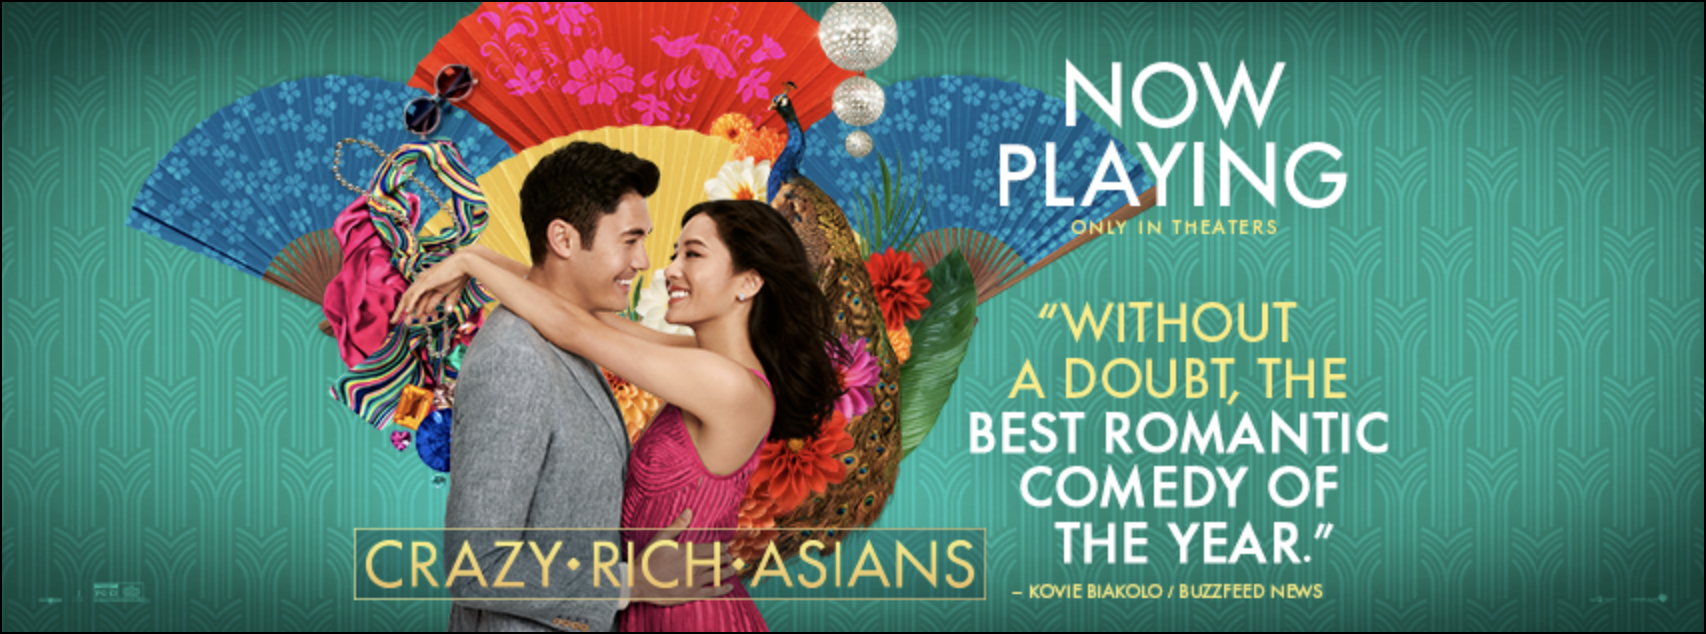 Crazy Rich Asians Official Facebook Cover